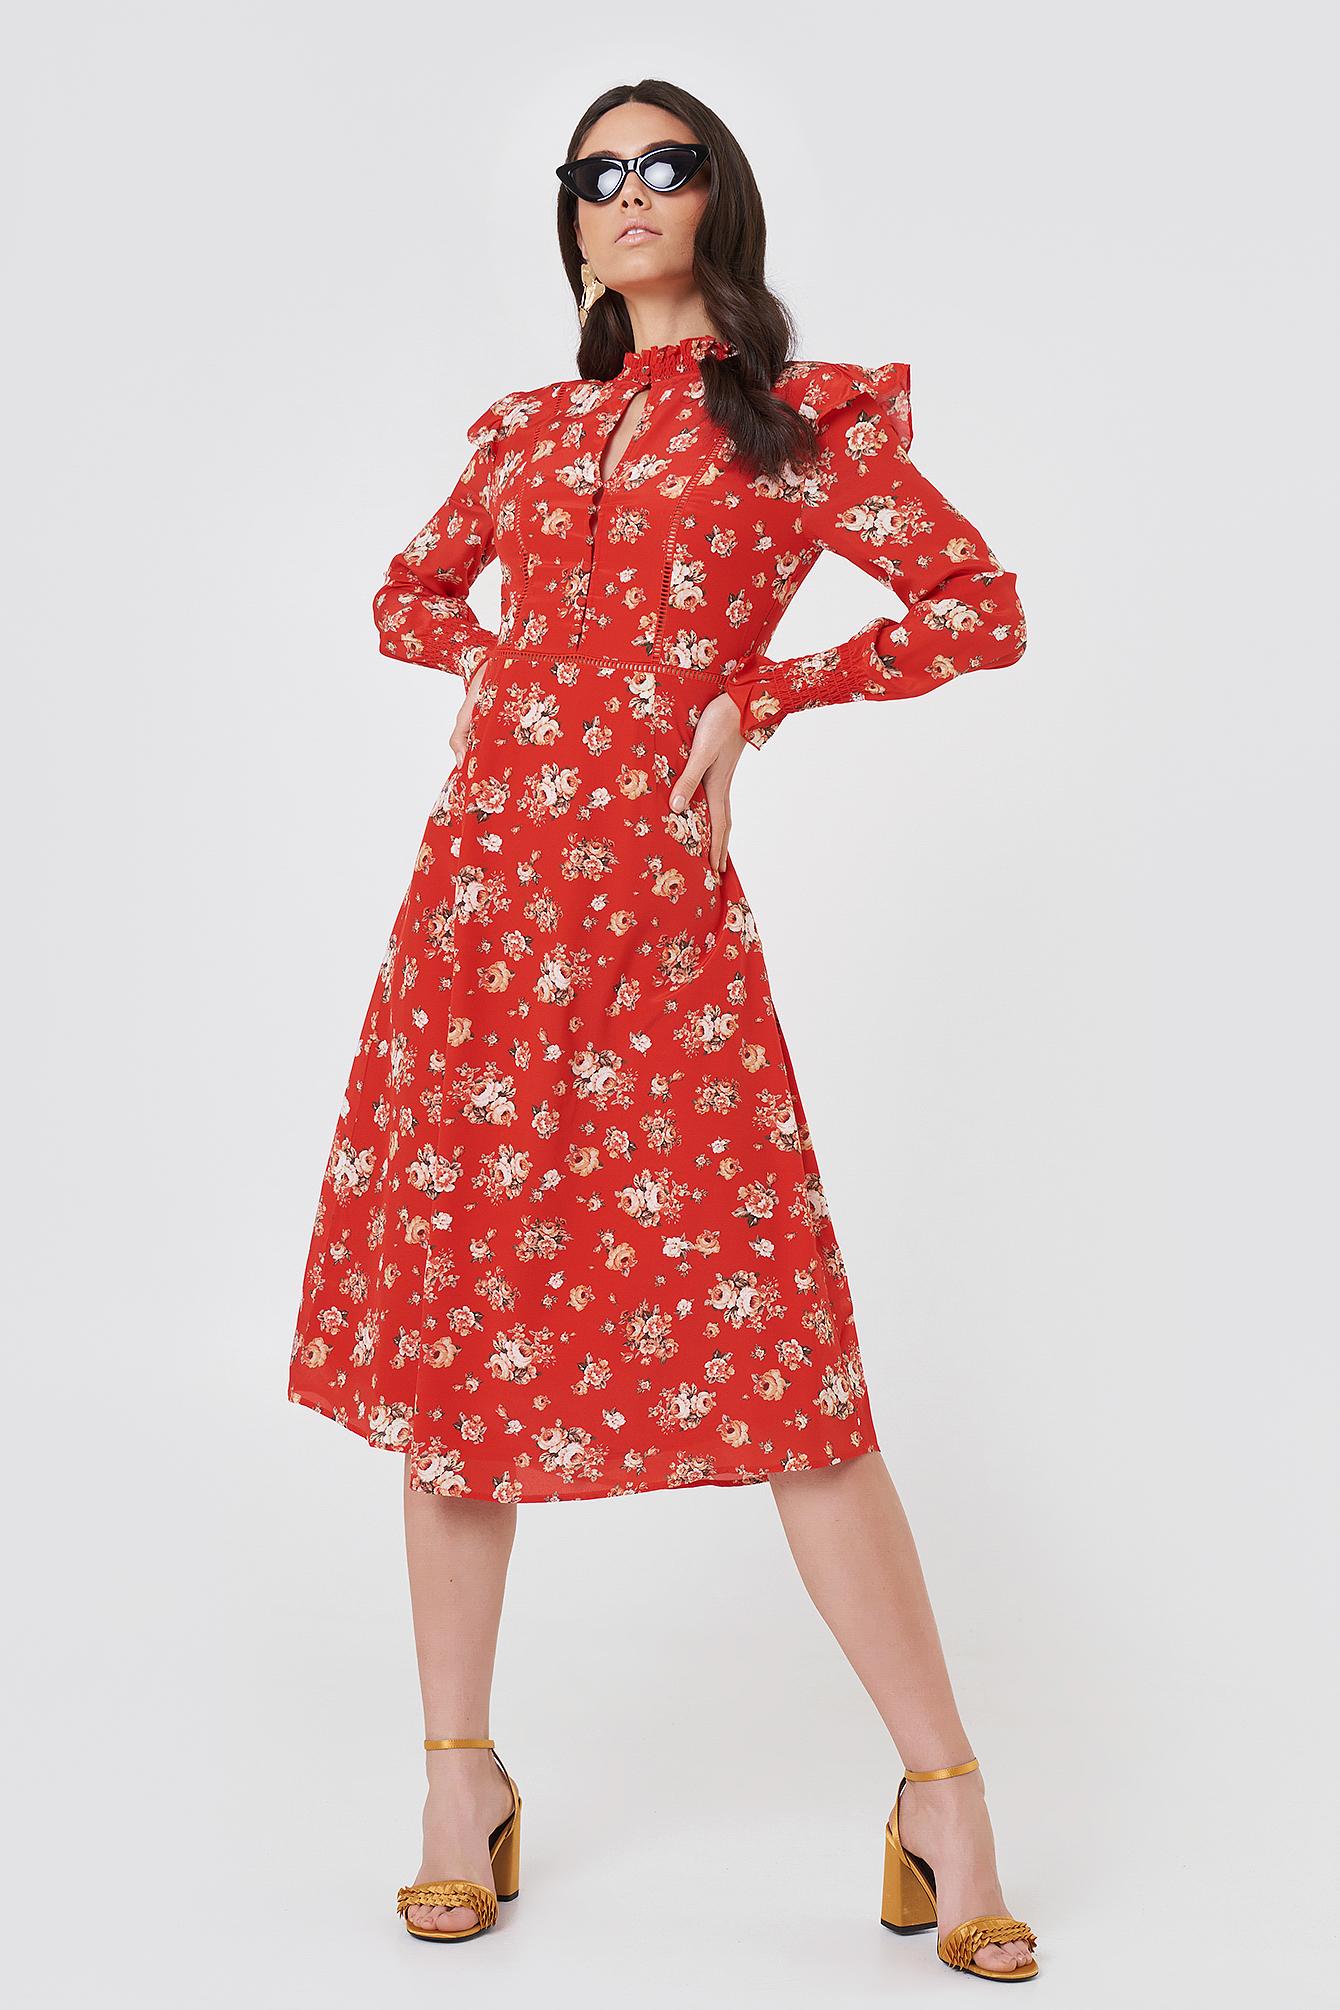 FWSS BODIL DRESS - RED